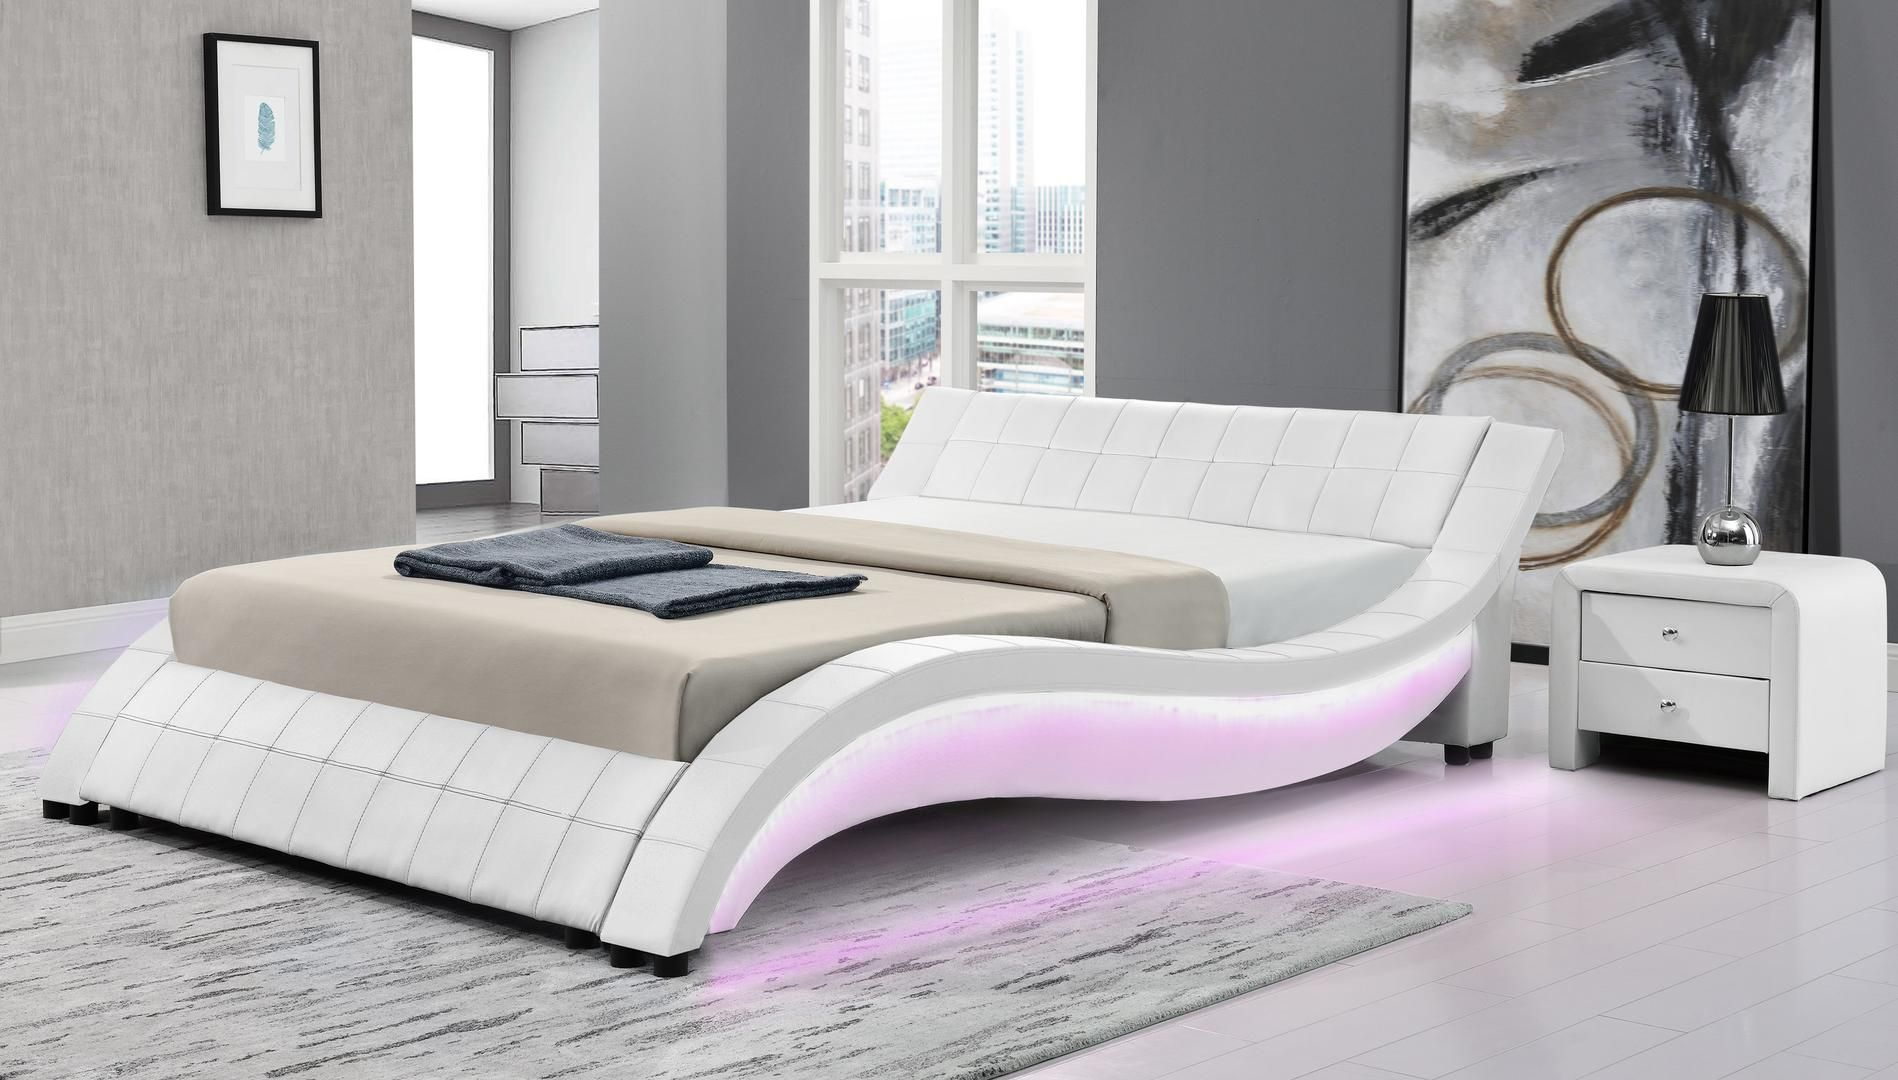 Milo Italia Aurora Queen Size Bed Auroraqnwh21 White Appliances